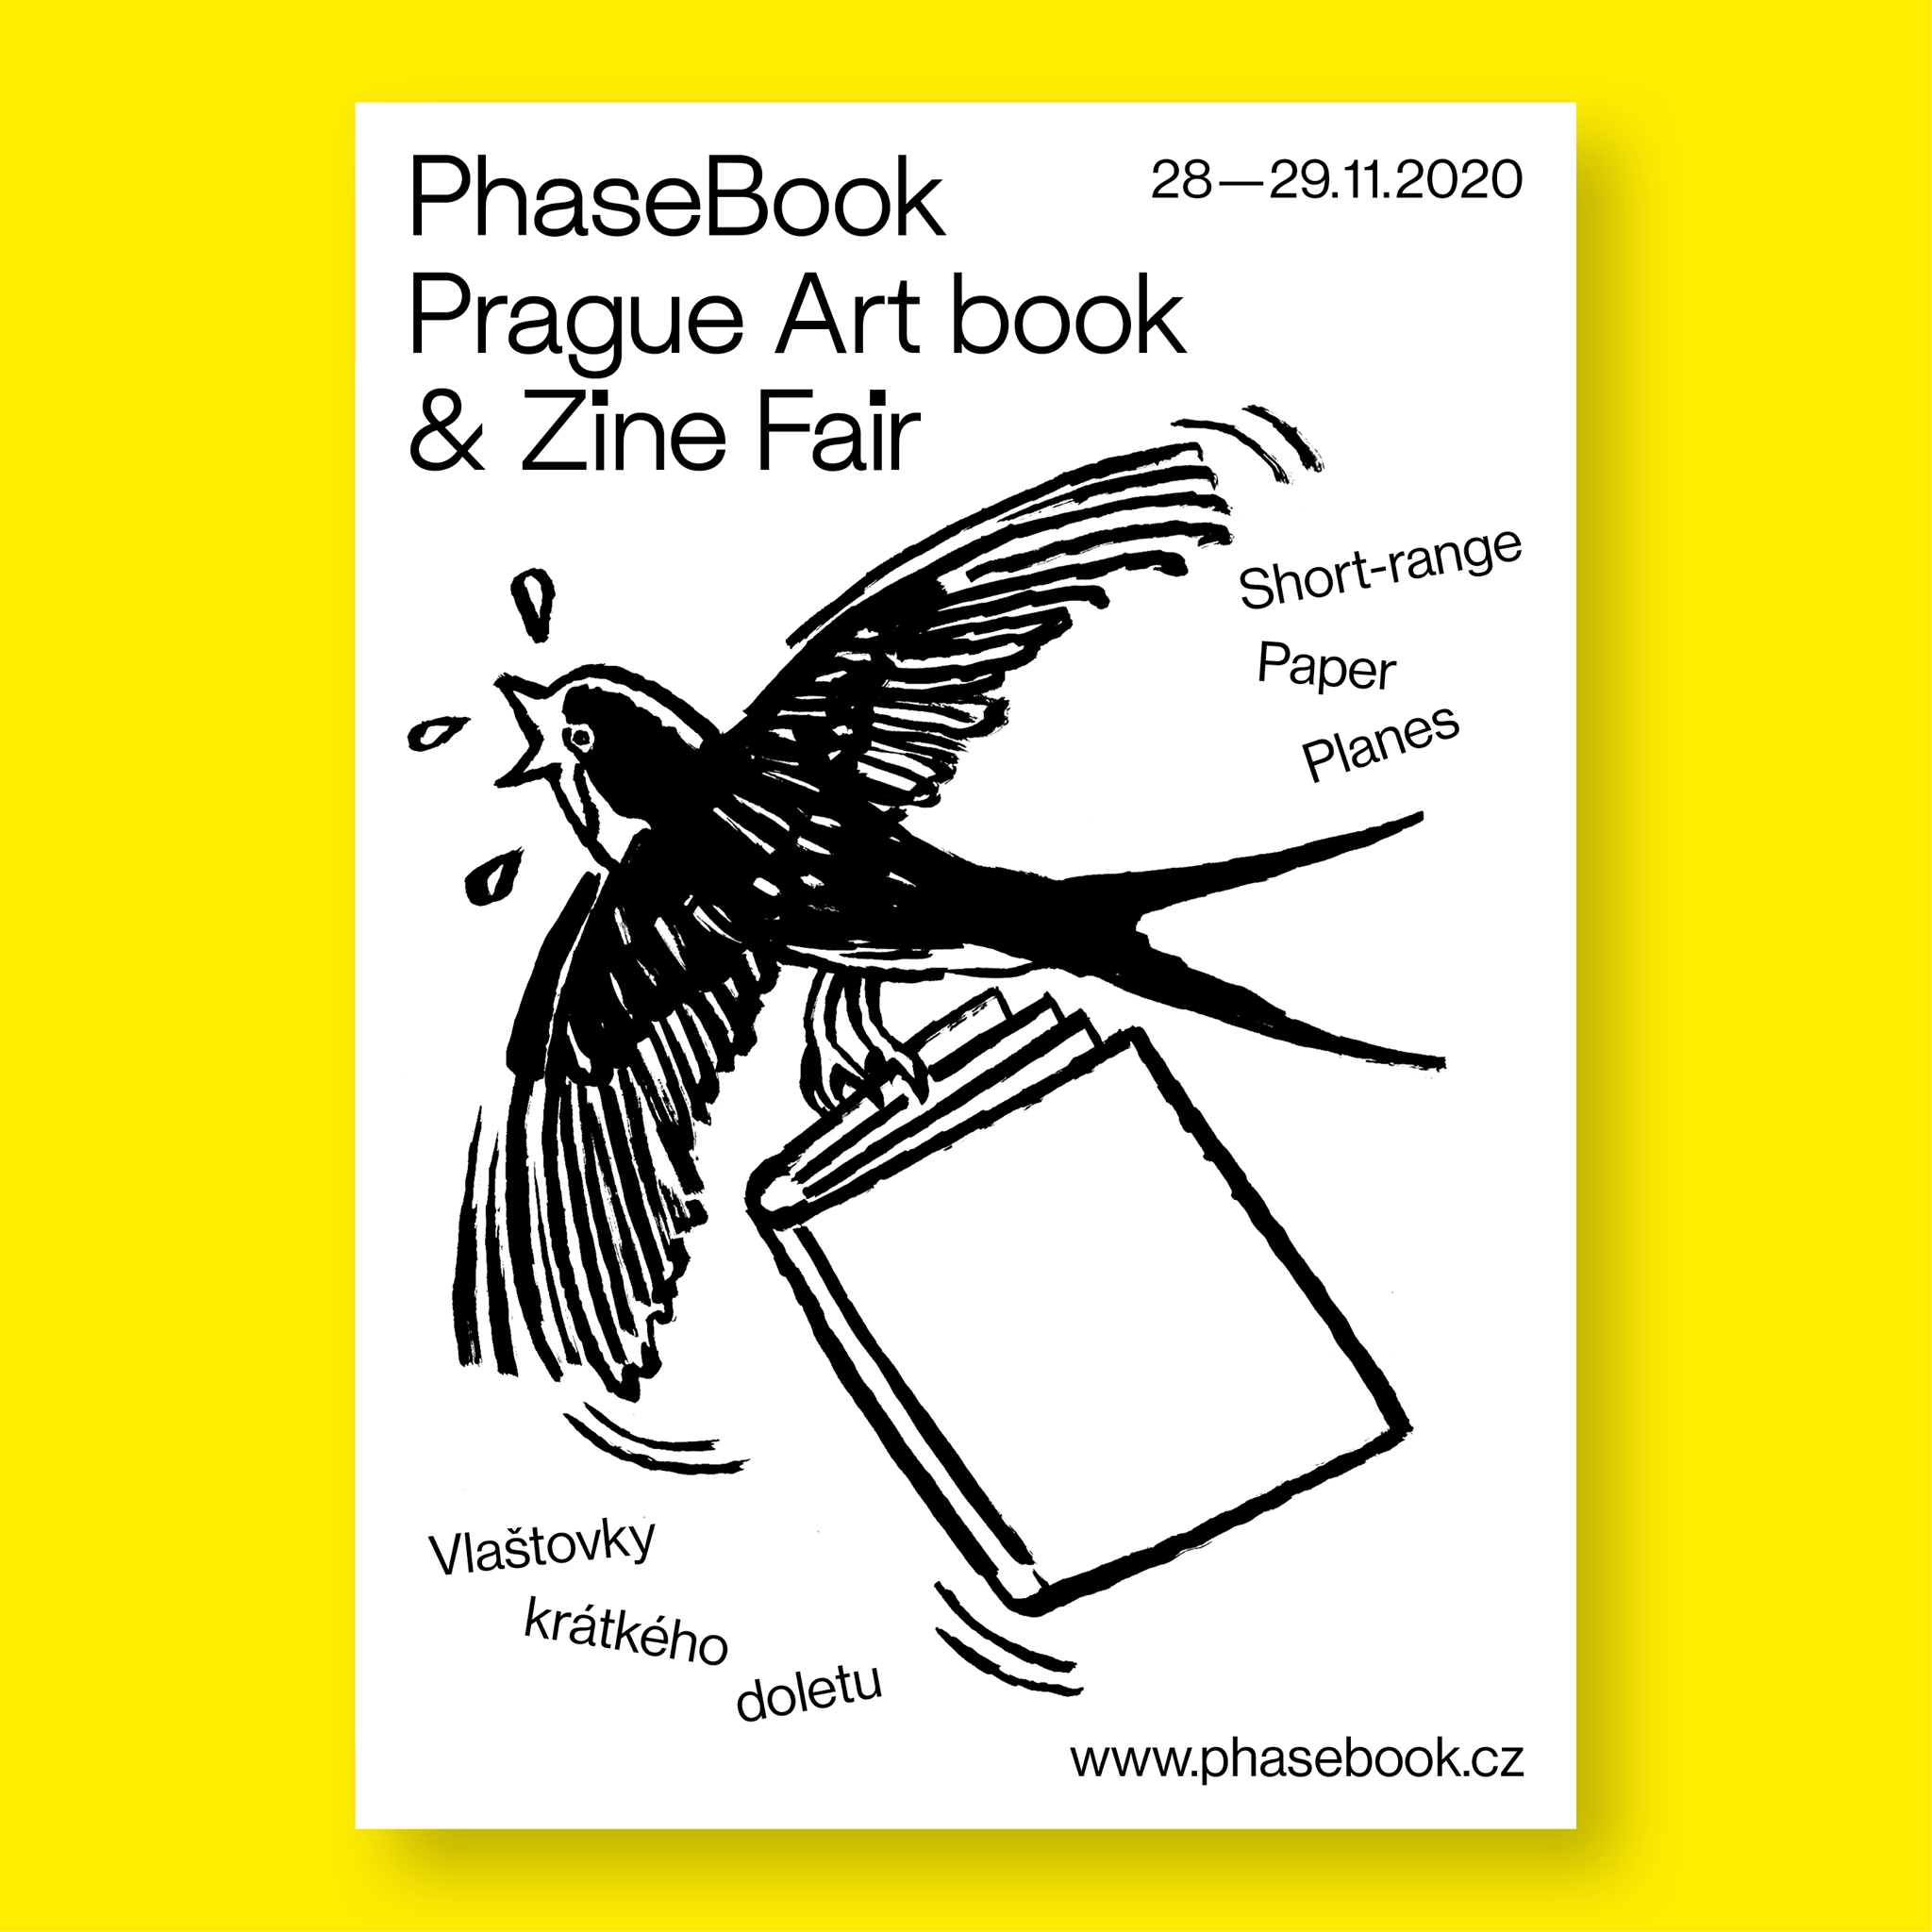 PhaseBook 2020: Prague Art book & Zine Fair